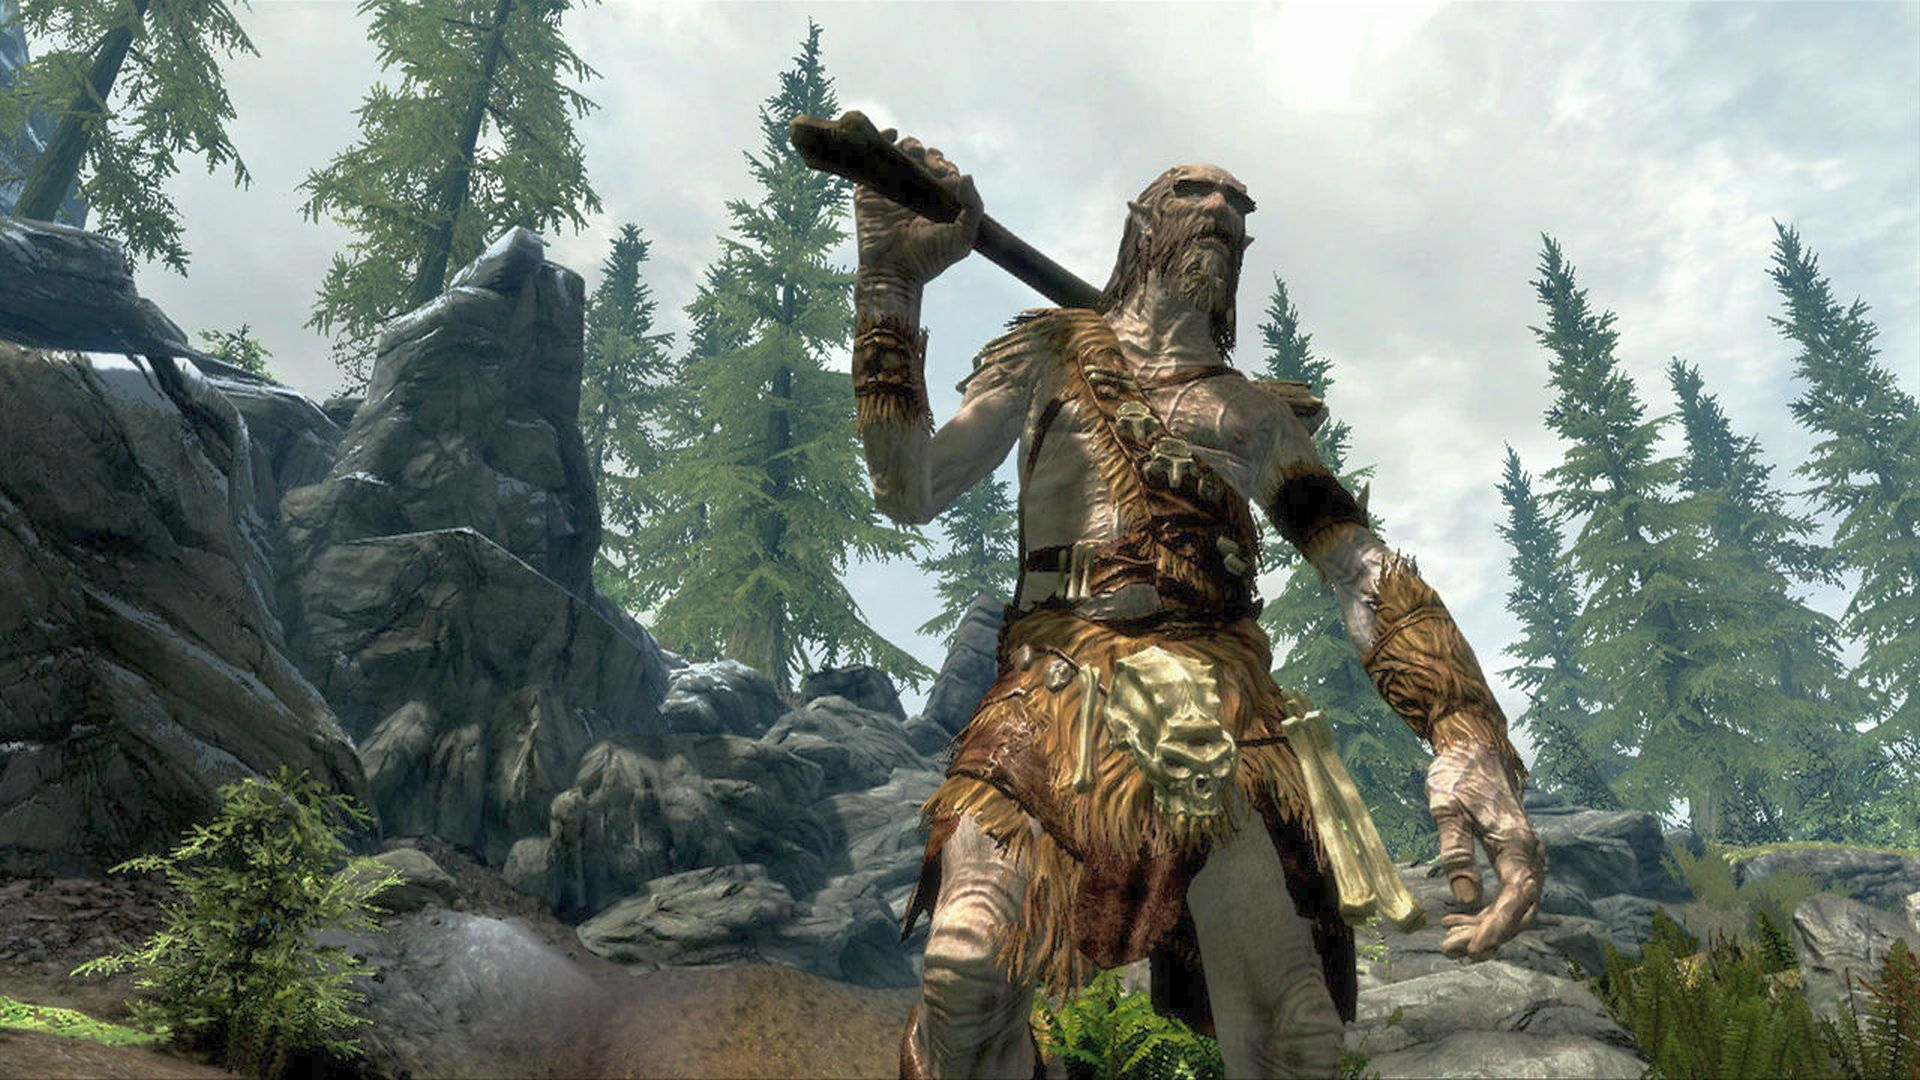 This Skyrim mod lets you yeet NPCs across the land like a giant